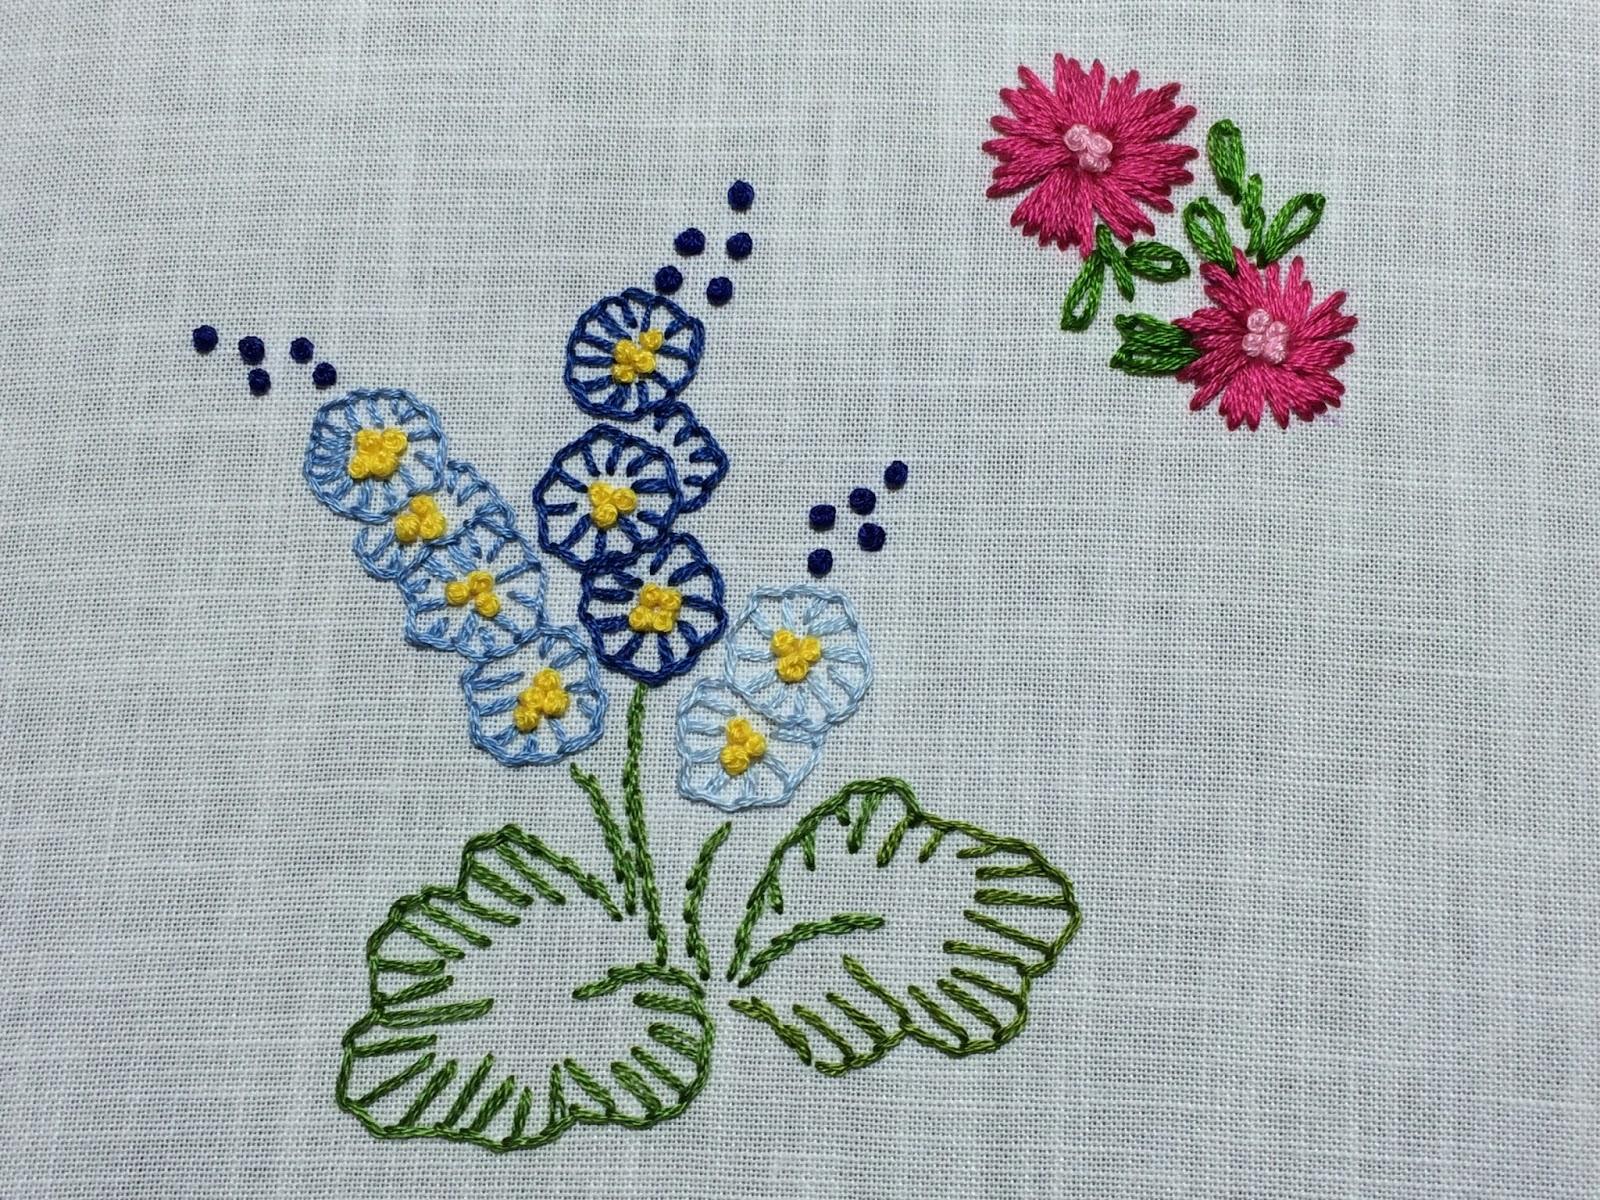 blanket stitch flowers